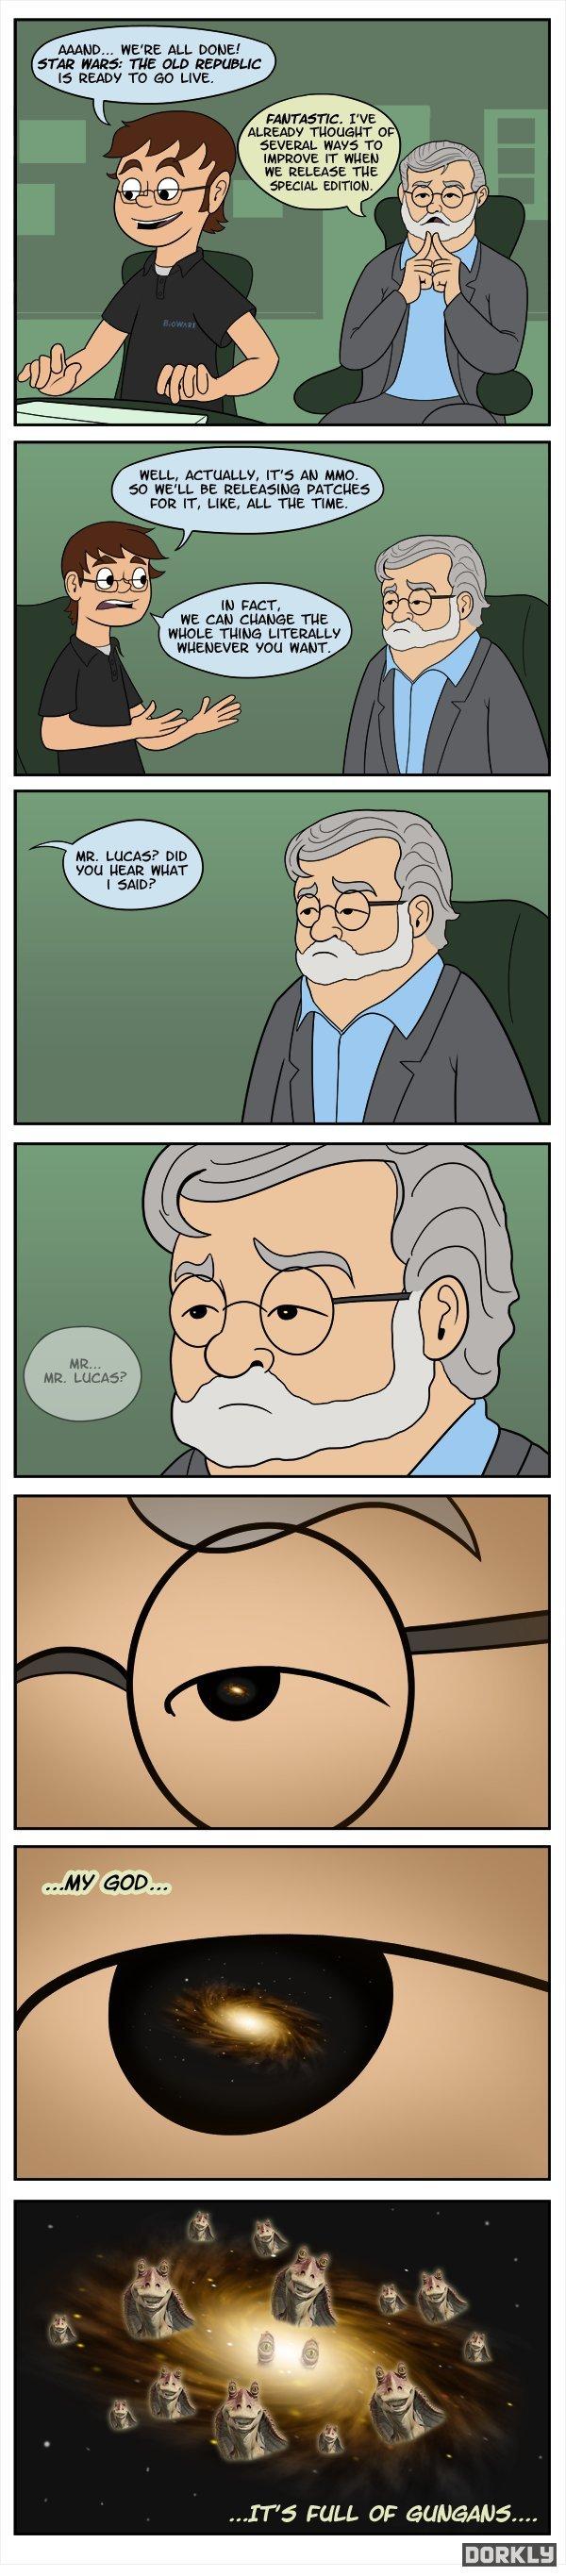 "Star Wars Vs. George Lucas. Pretty much. WE' RE ALL DUNE! STAR "". THE HERMES Jimi?, TD IMPROVE ET ' -I 51-"" EEVN... EDITING. WELL, ACTUA' -ELLE', ] All HMO. 513 EEYUP"